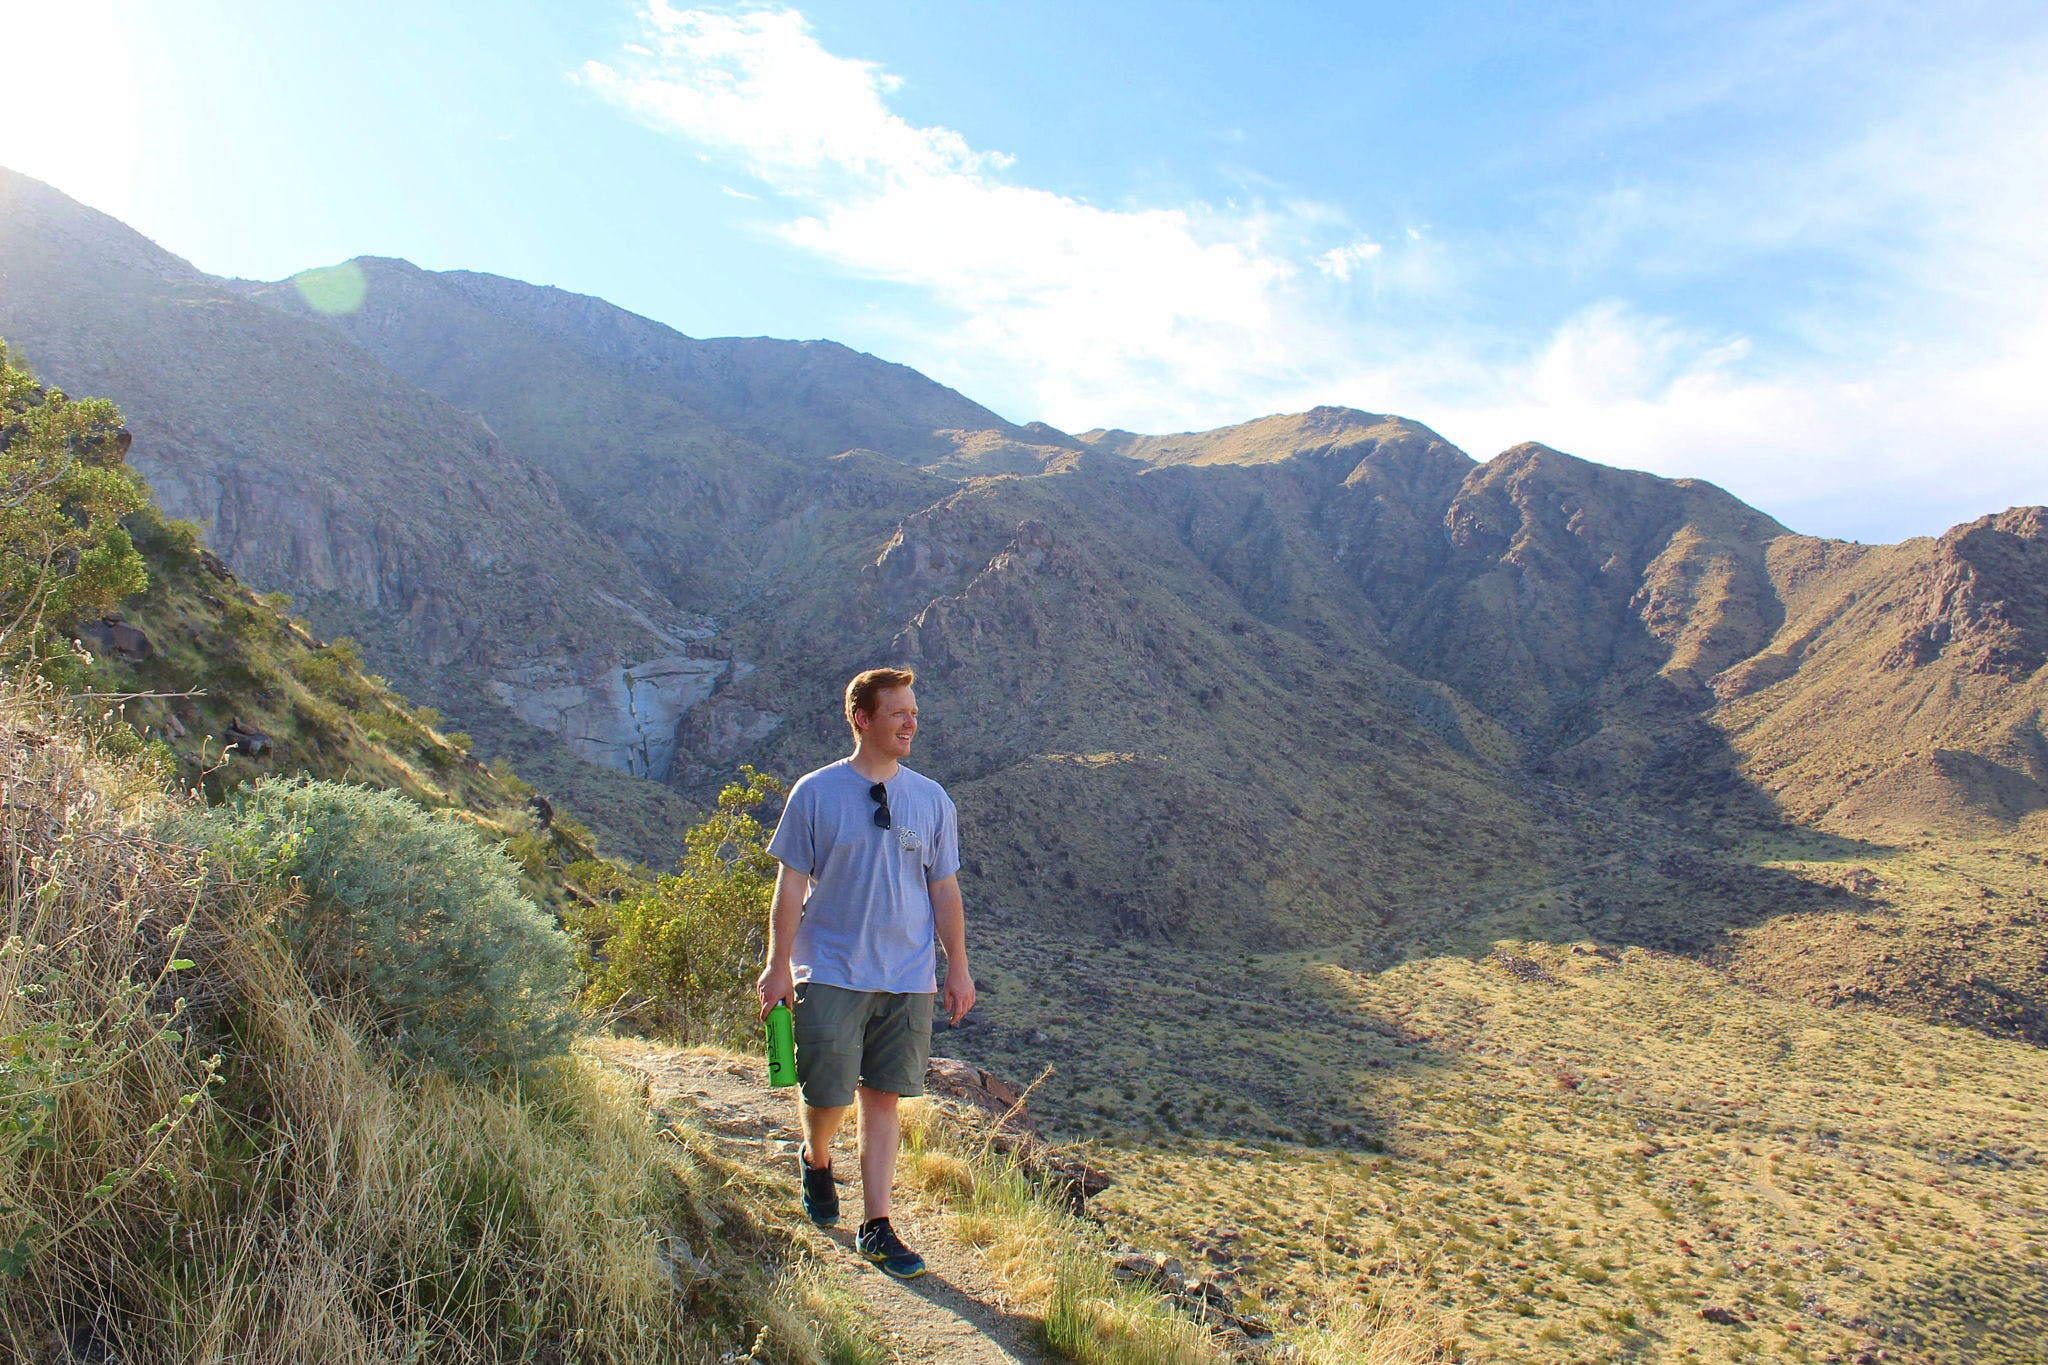 Hike Tachevah Canyon Rim to Rim San Jacinto mountain range